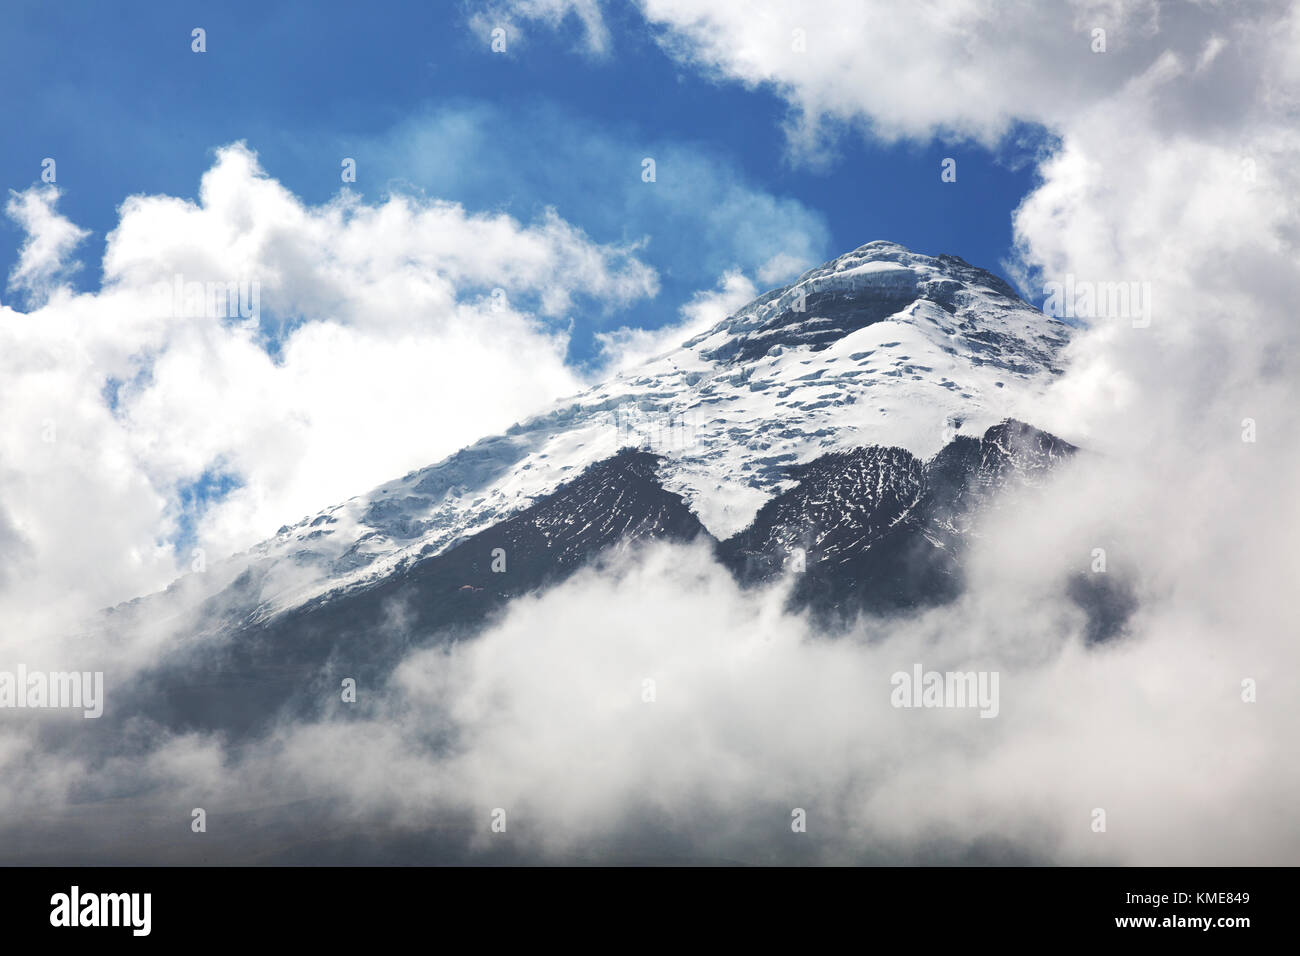 Vulkan Cotopaxi - Schnee rauchen Gipfel des zweithöchsten Berg Ecuadors, in der Provinz Cotopaxi Nationalpark, Stockbild